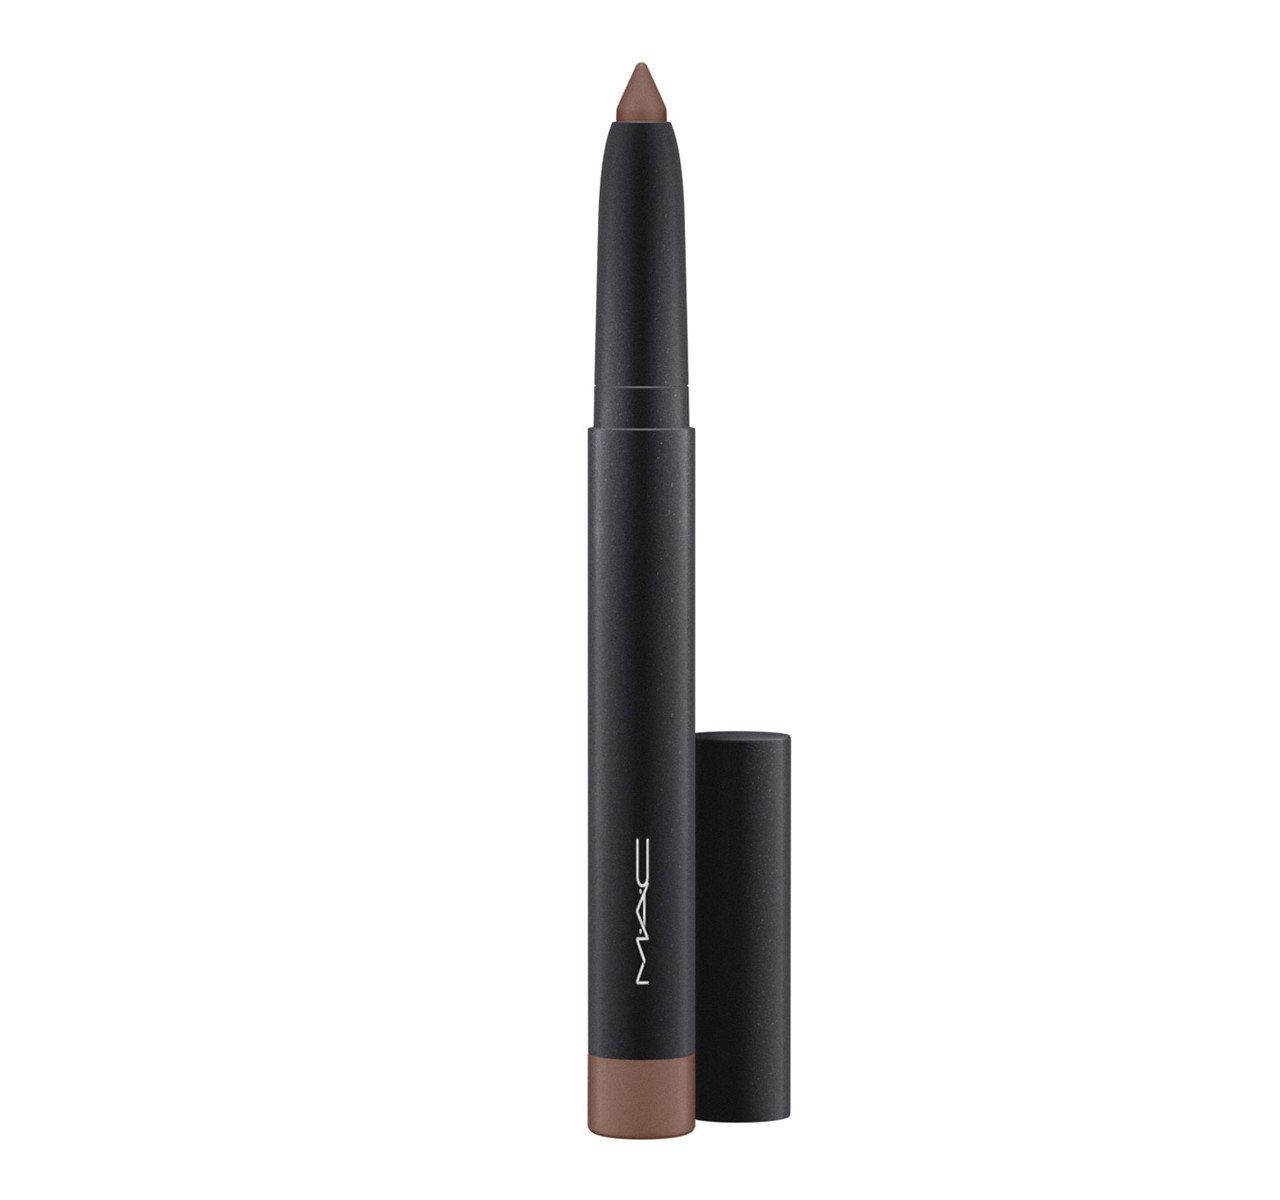 Amazon Mac Cosmetics Big Brow Pencil Crayon Spiked Beauty